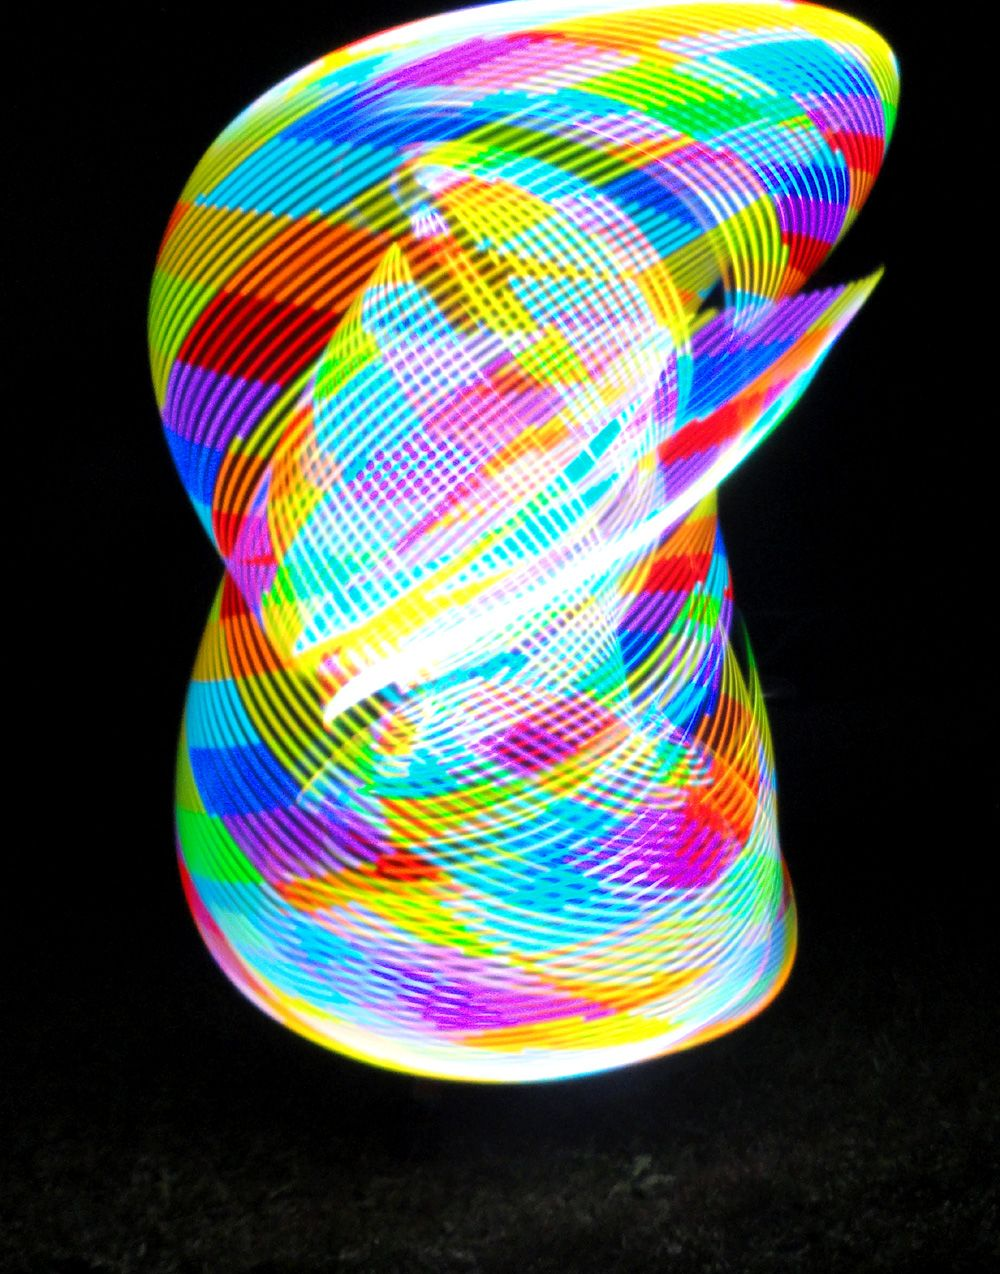 helix hoop i choose you!